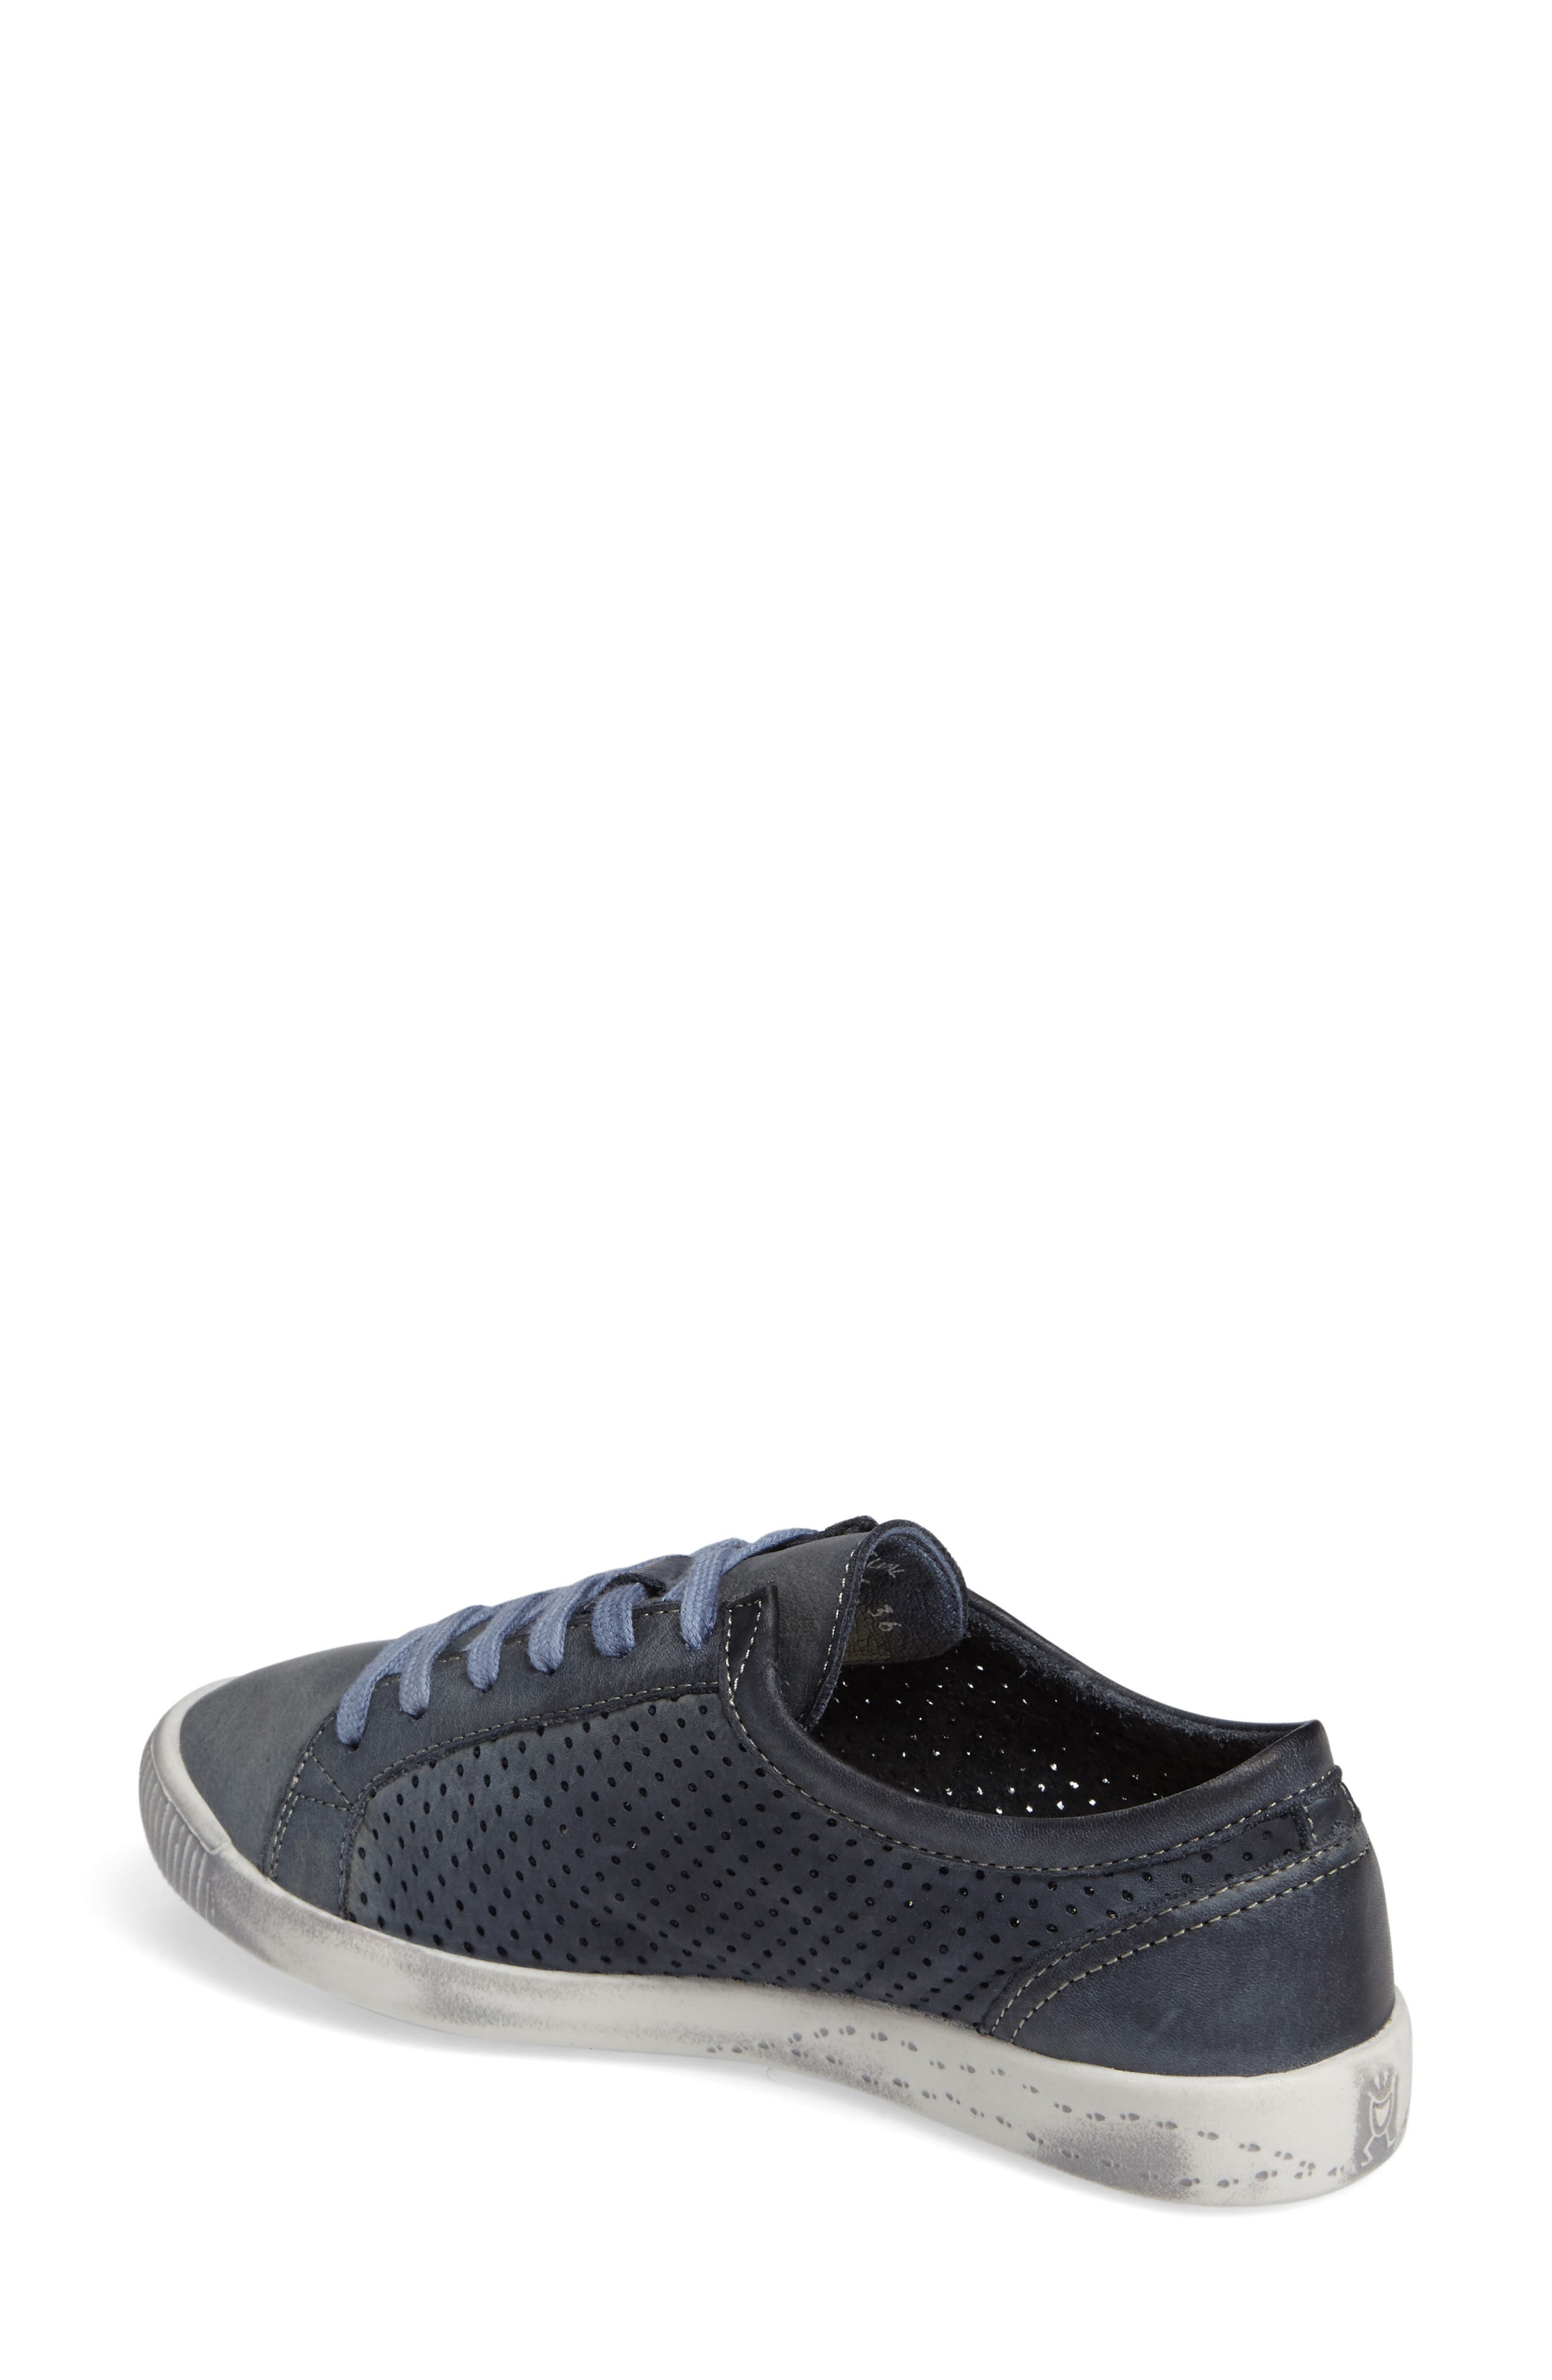 Ica Sneaker,                             Alternate thumbnail 15, color,